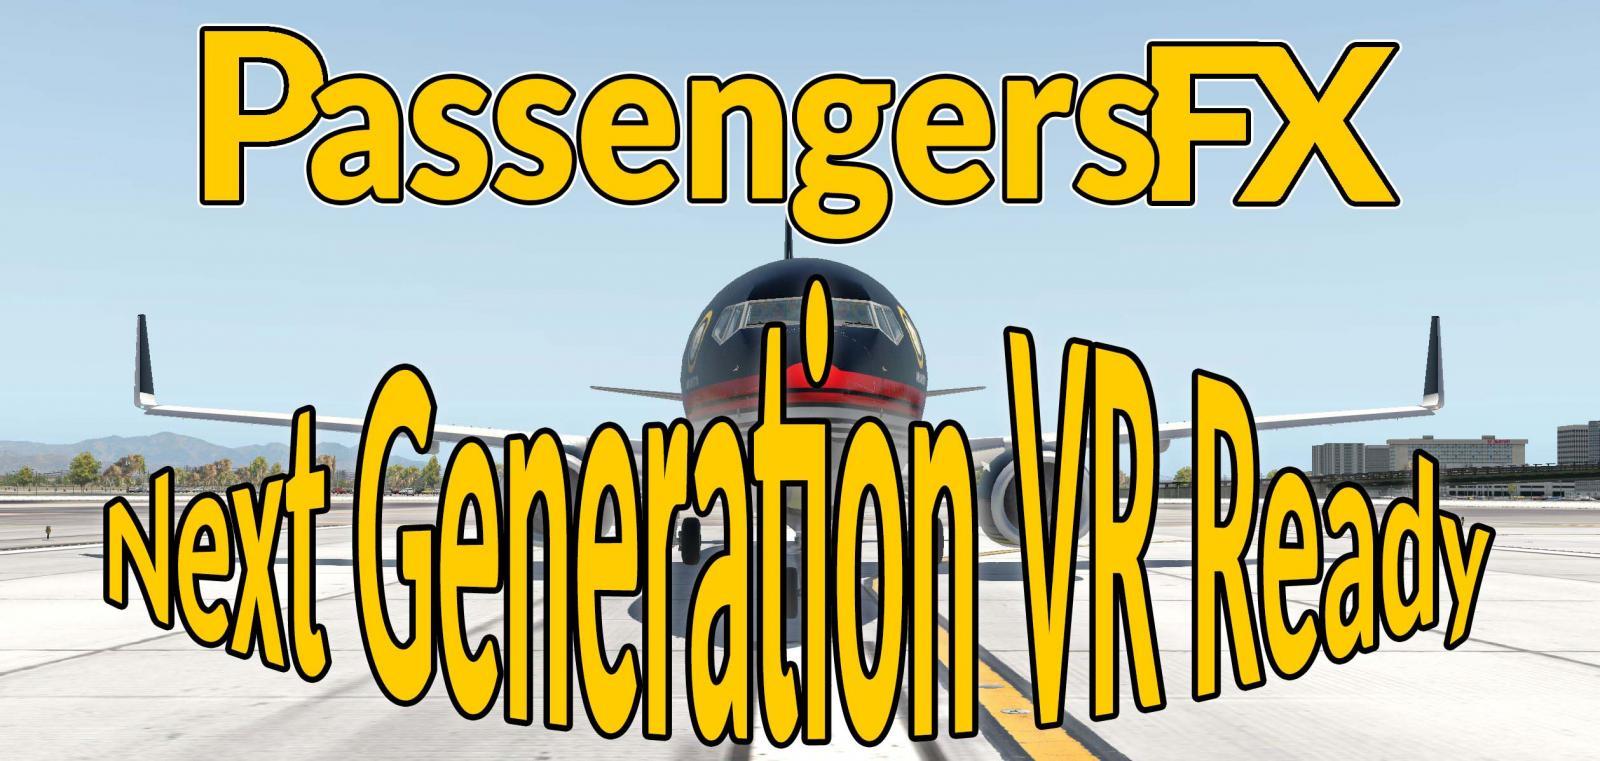 Passengersfx Ng Next Generation Vr Ready Basic Edition